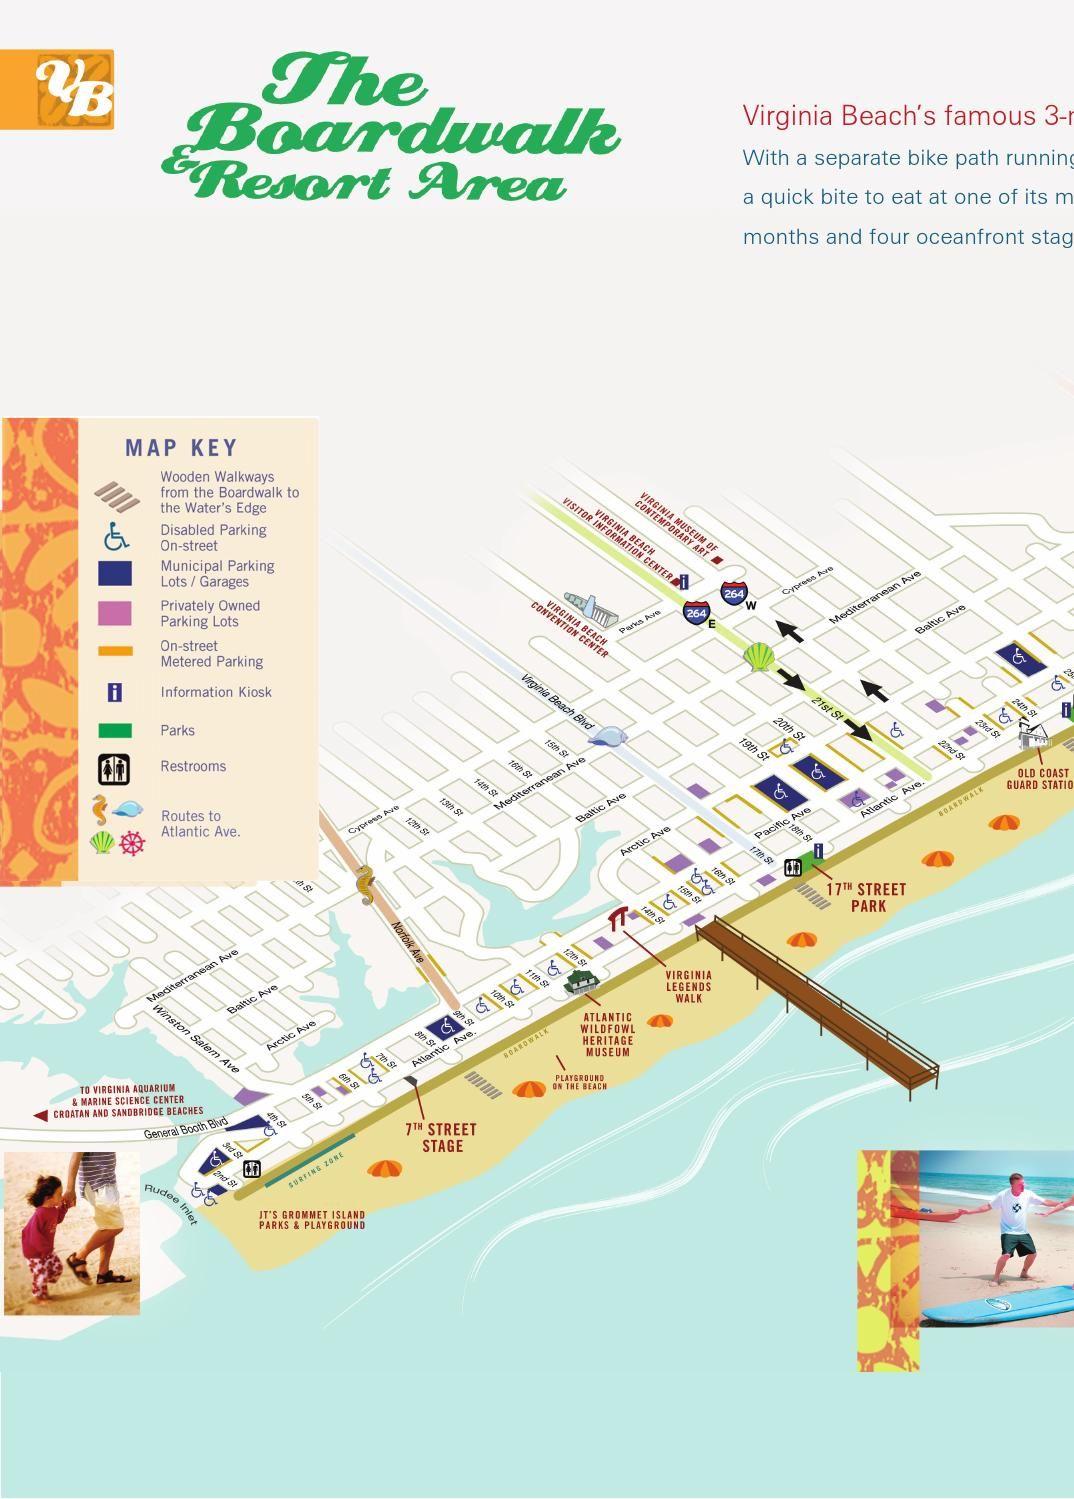 2014 Virginia Beach Vacation Guide Virginia Beach